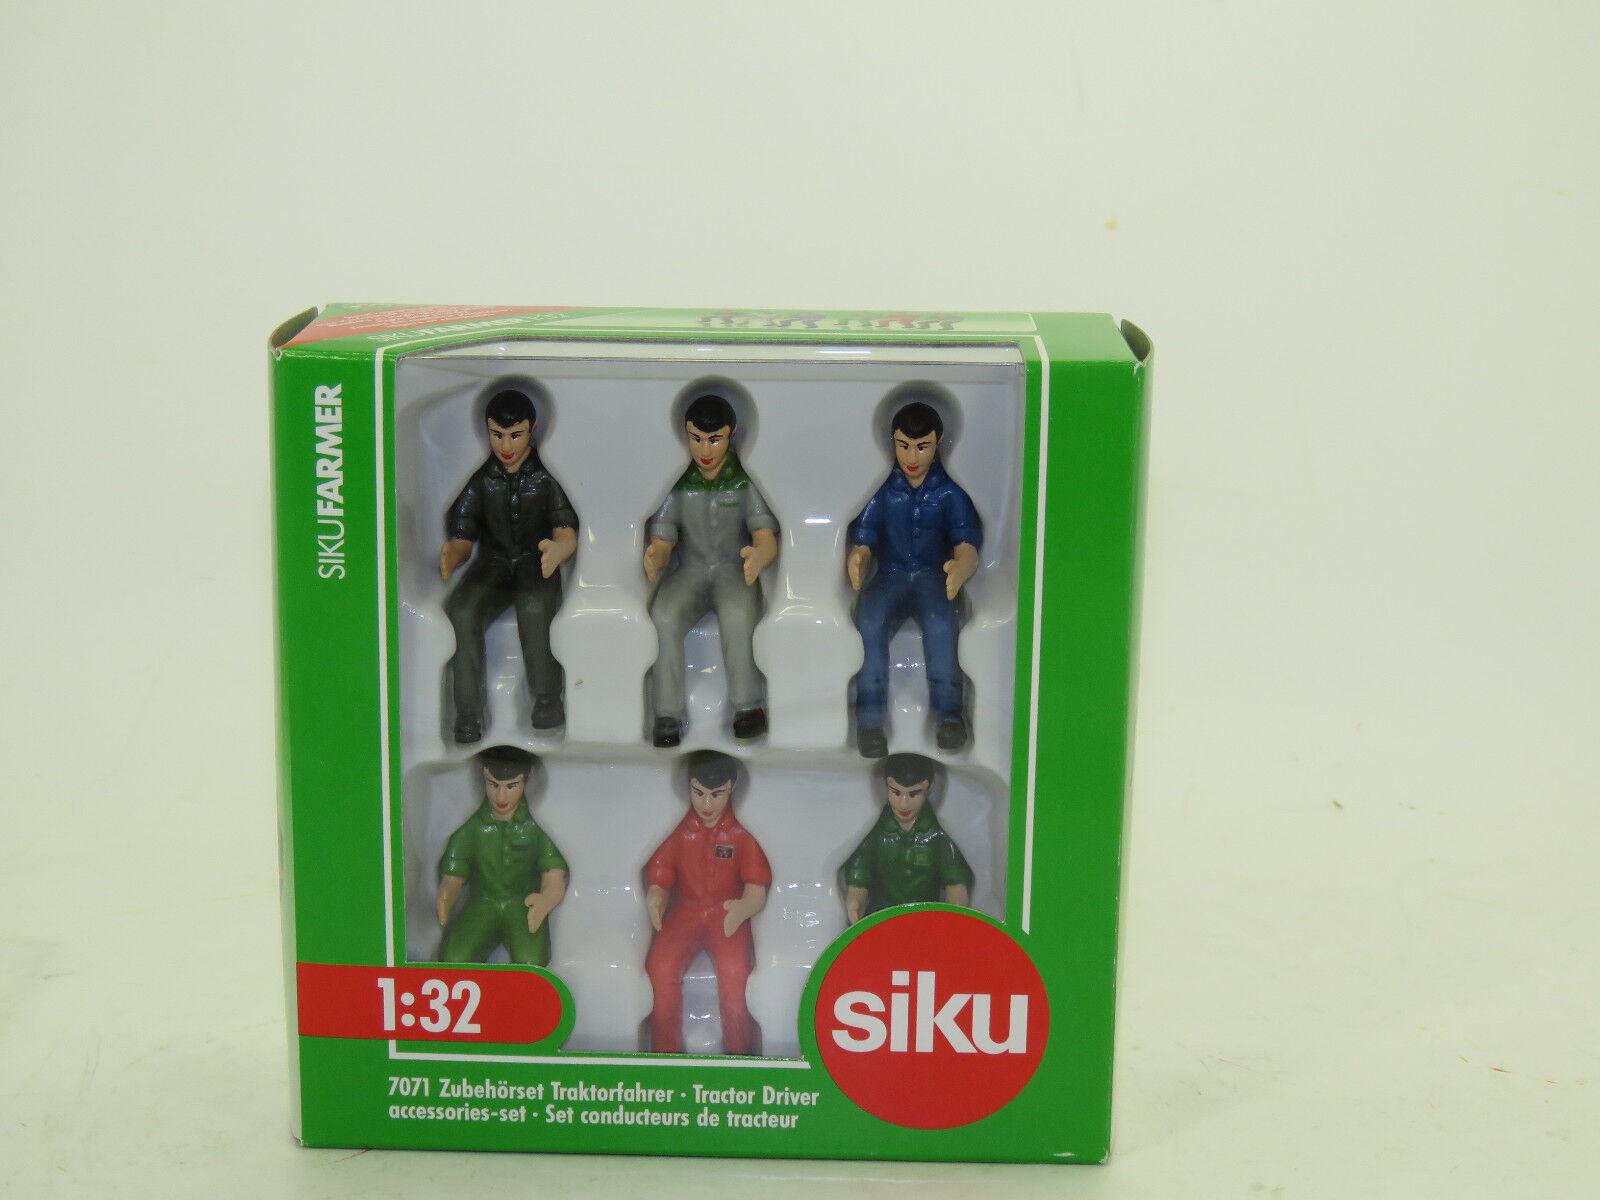 Siku 7071 Zubehoerset Pilote Tracteur 1 3 3 3 2 Nouvelles Emballage D'Origine 865326